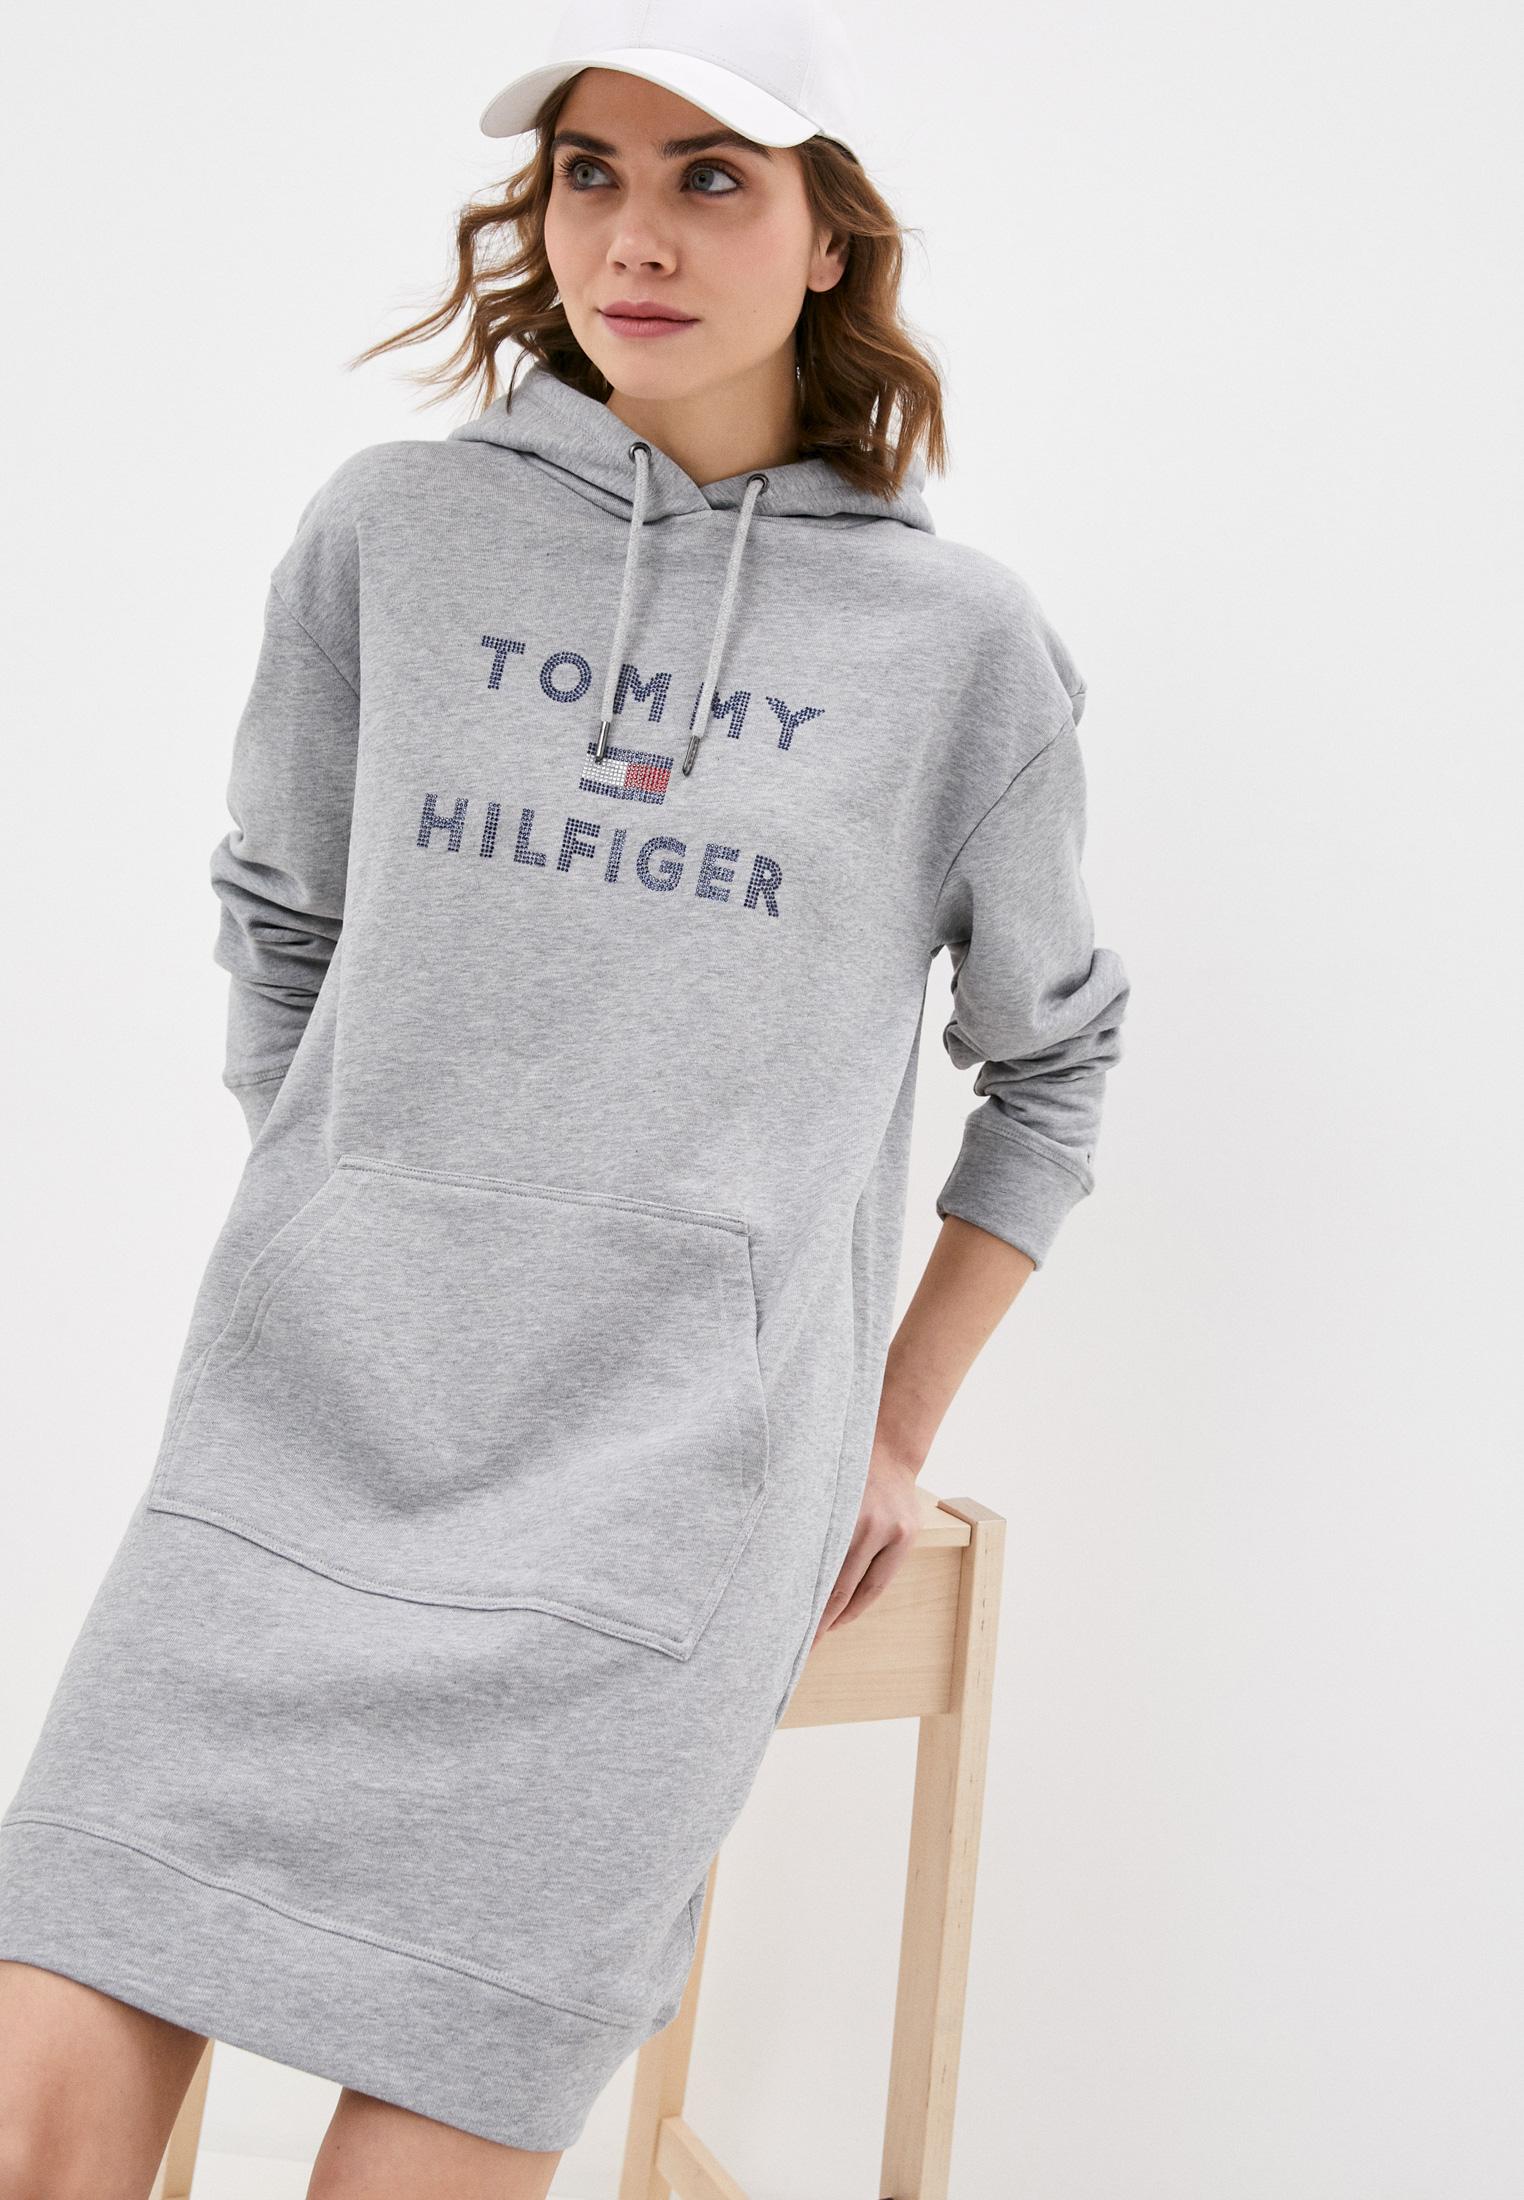 Платье Tommy Hilfiger (Томми Хилфигер) WW0WW31086: изображение 1